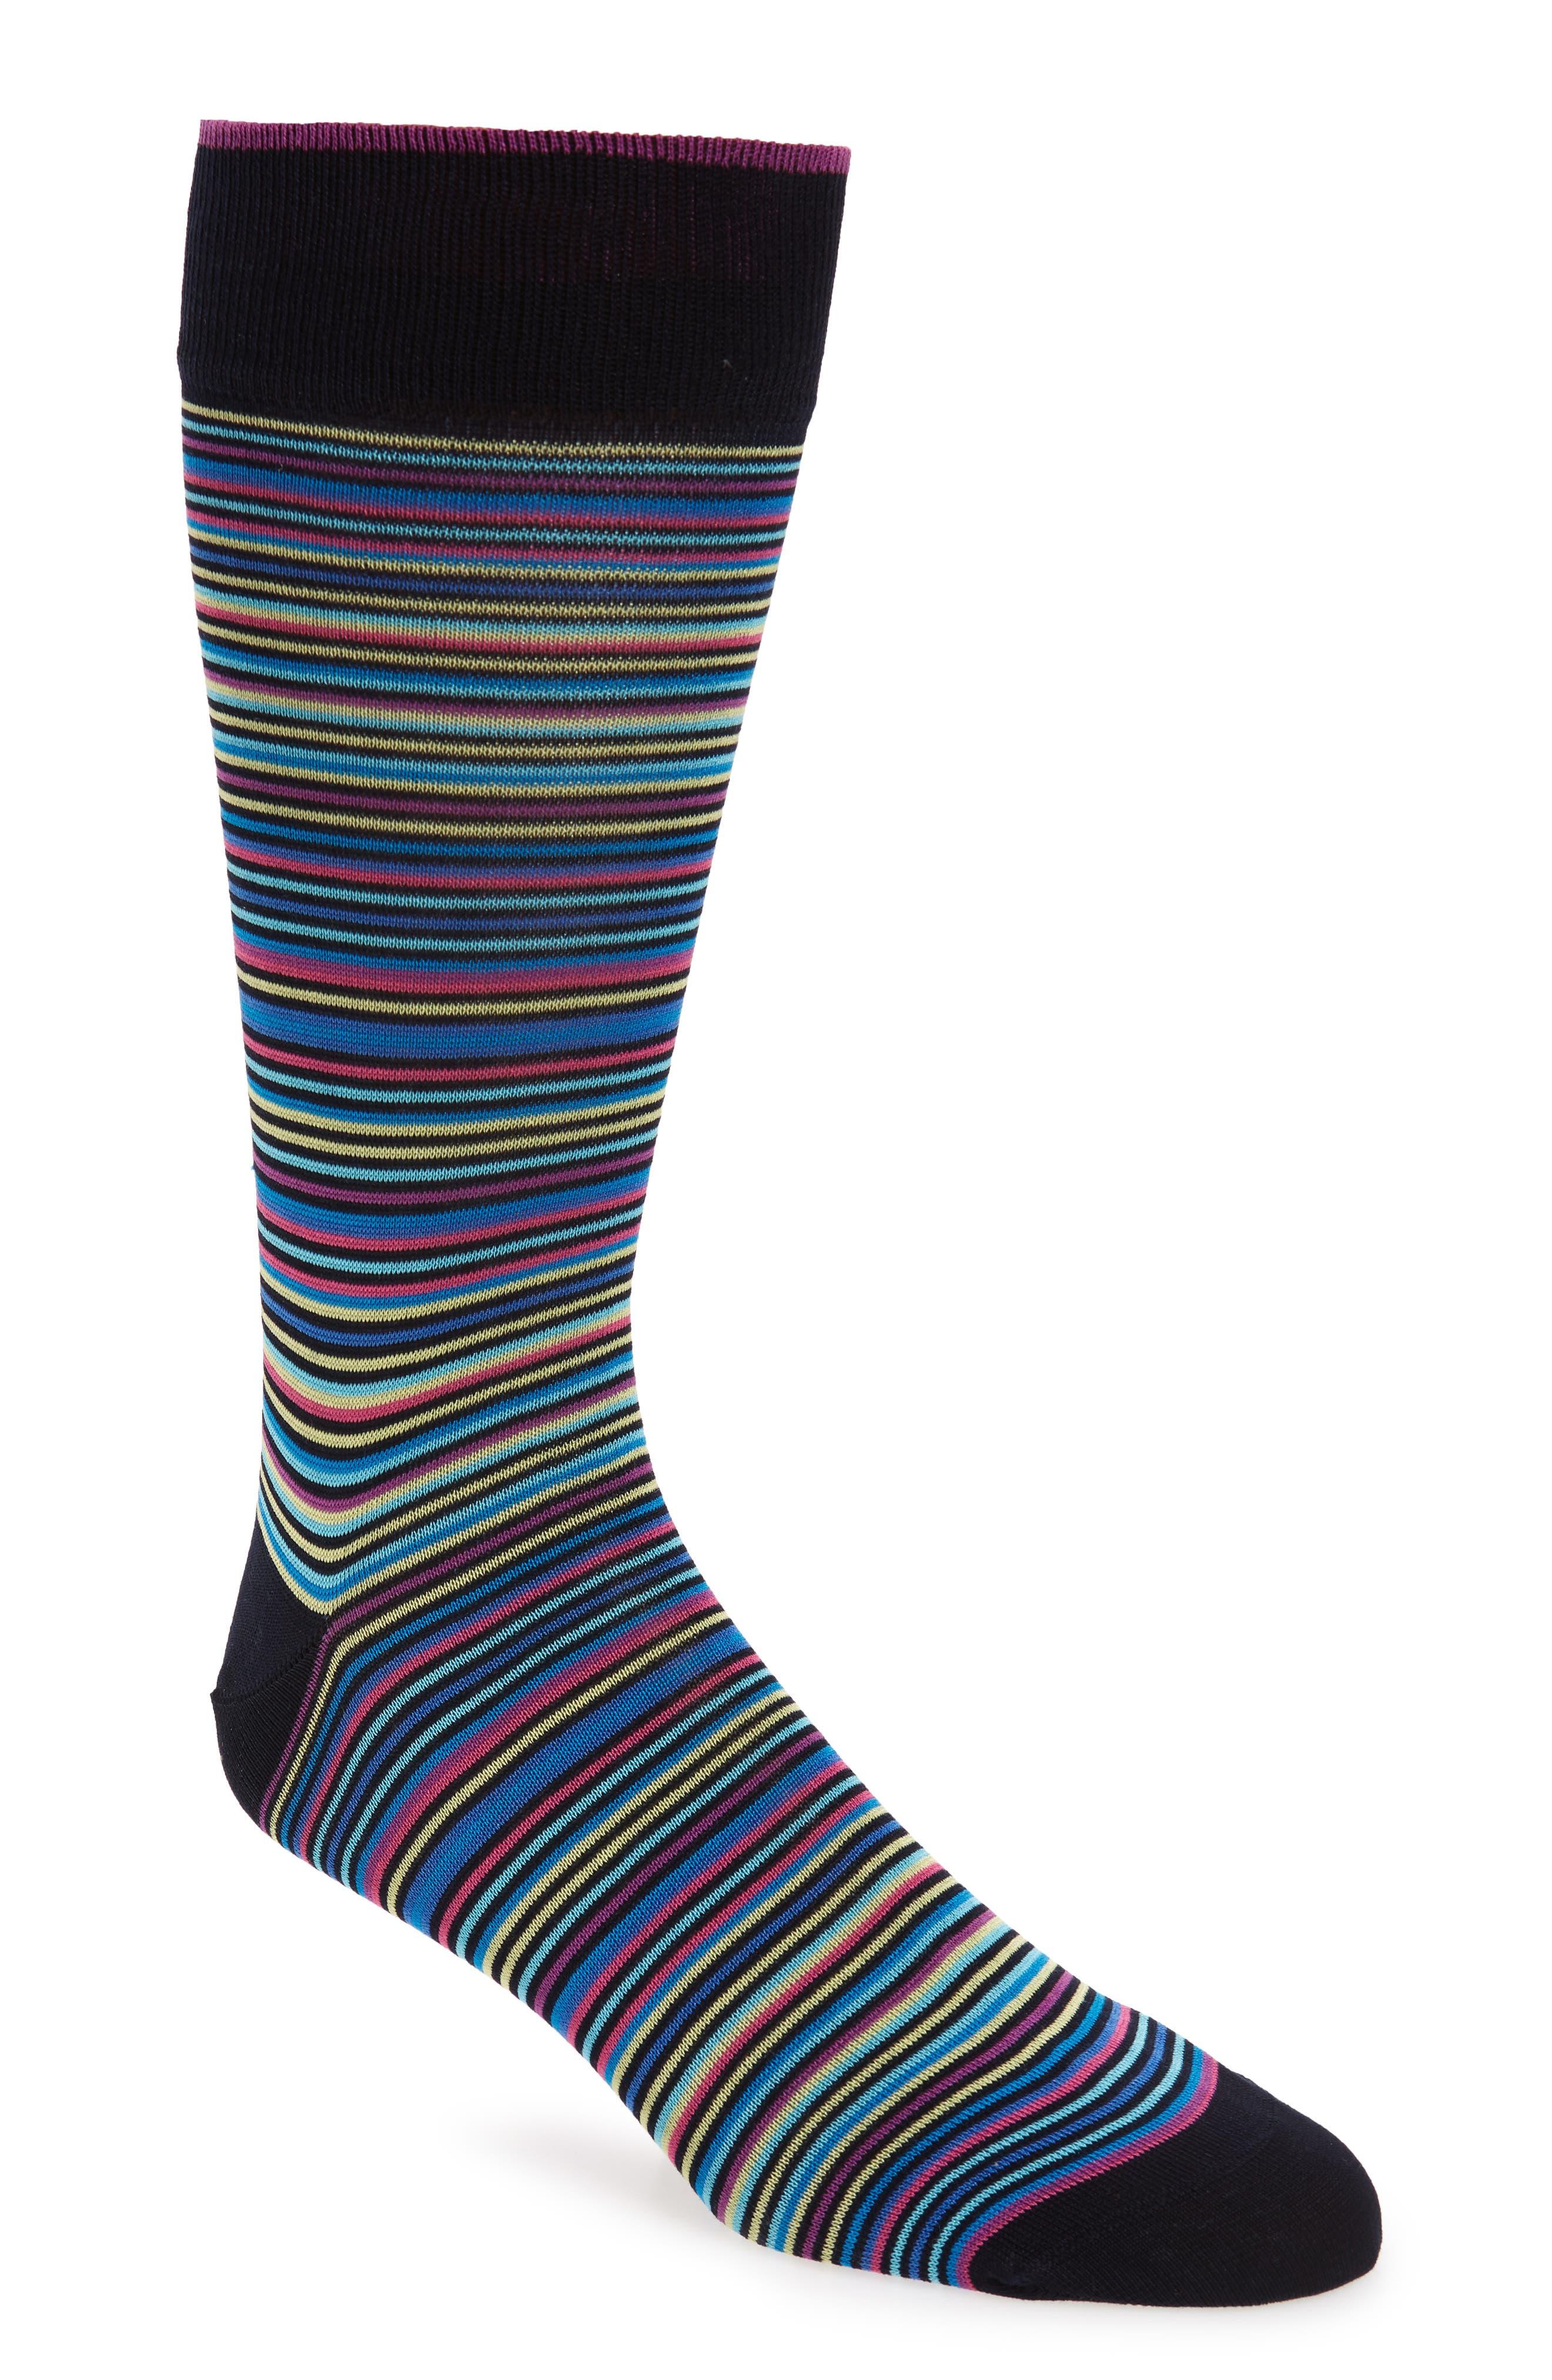 Stripe Mercerized Cotton Blend Socks,                             Main thumbnail 1, color,                             Berry